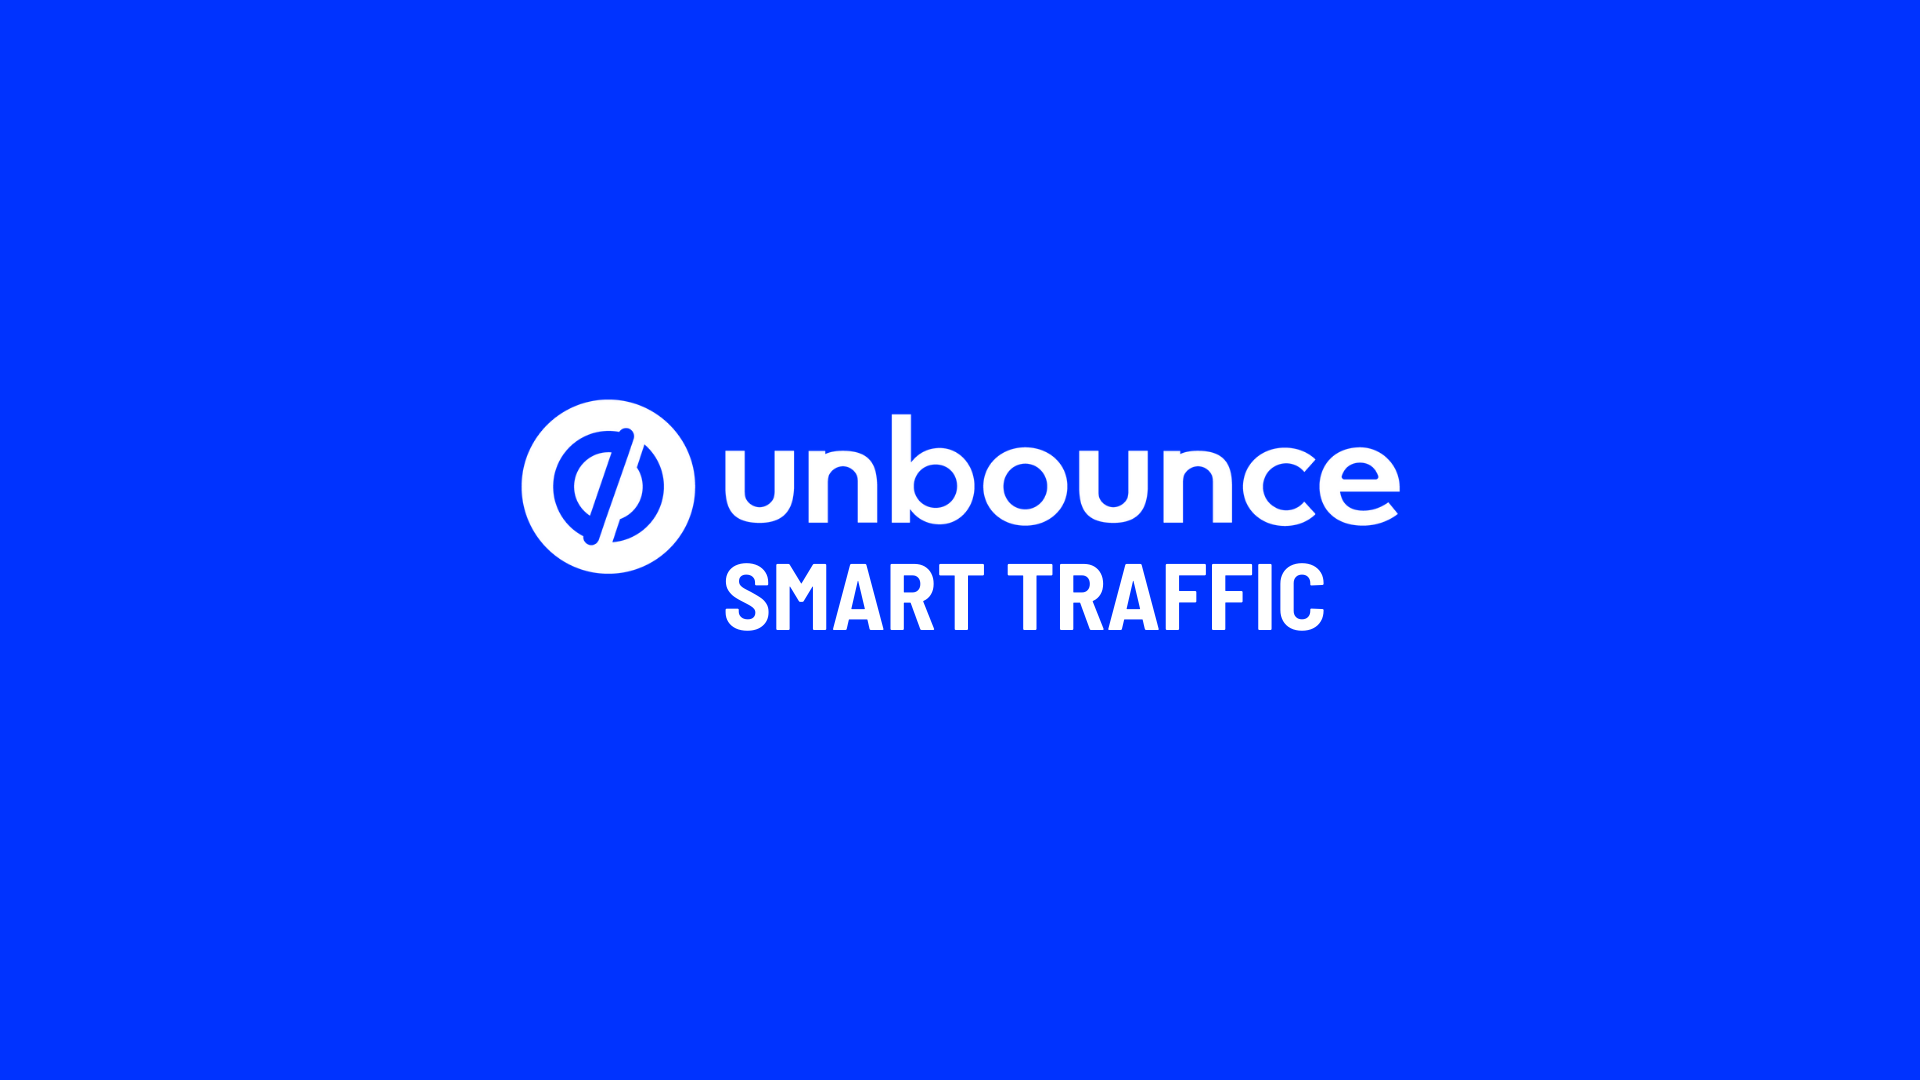 unbounce-smart-traffic